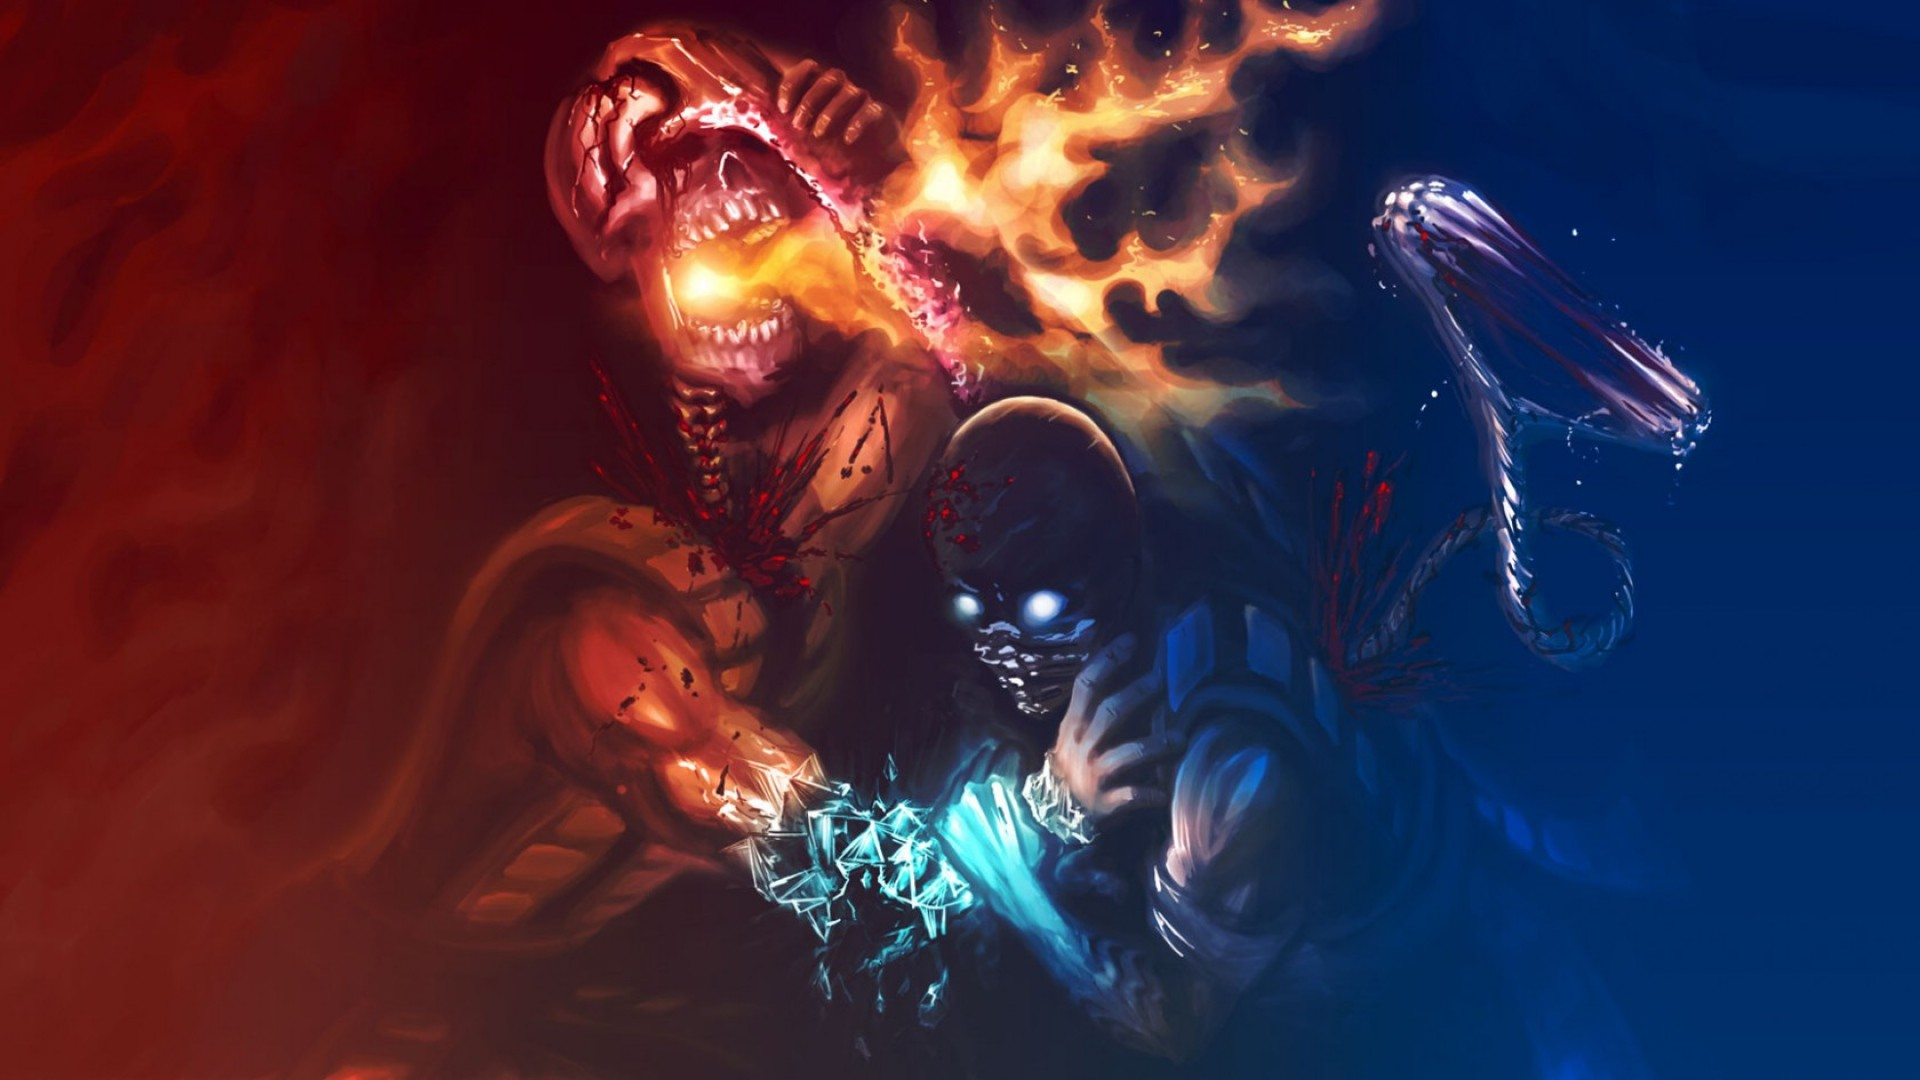 Scorpion Mortal Kombat Wallpaper 63 Pictures